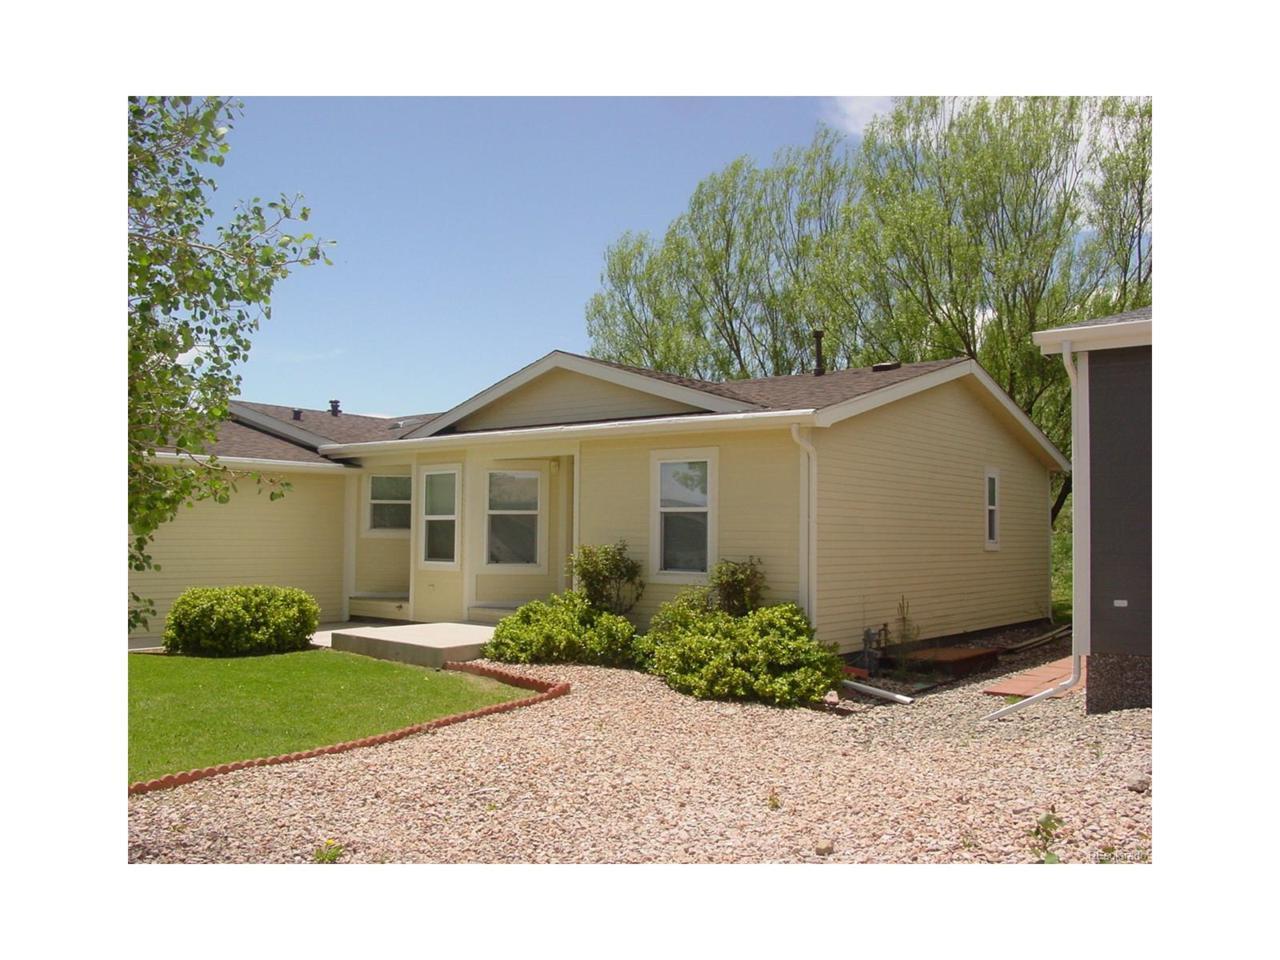 4505 Gray Fox Heights #192, Colorado Springs, CO 80922 (MLS #8687289) :: 8z Real Estate